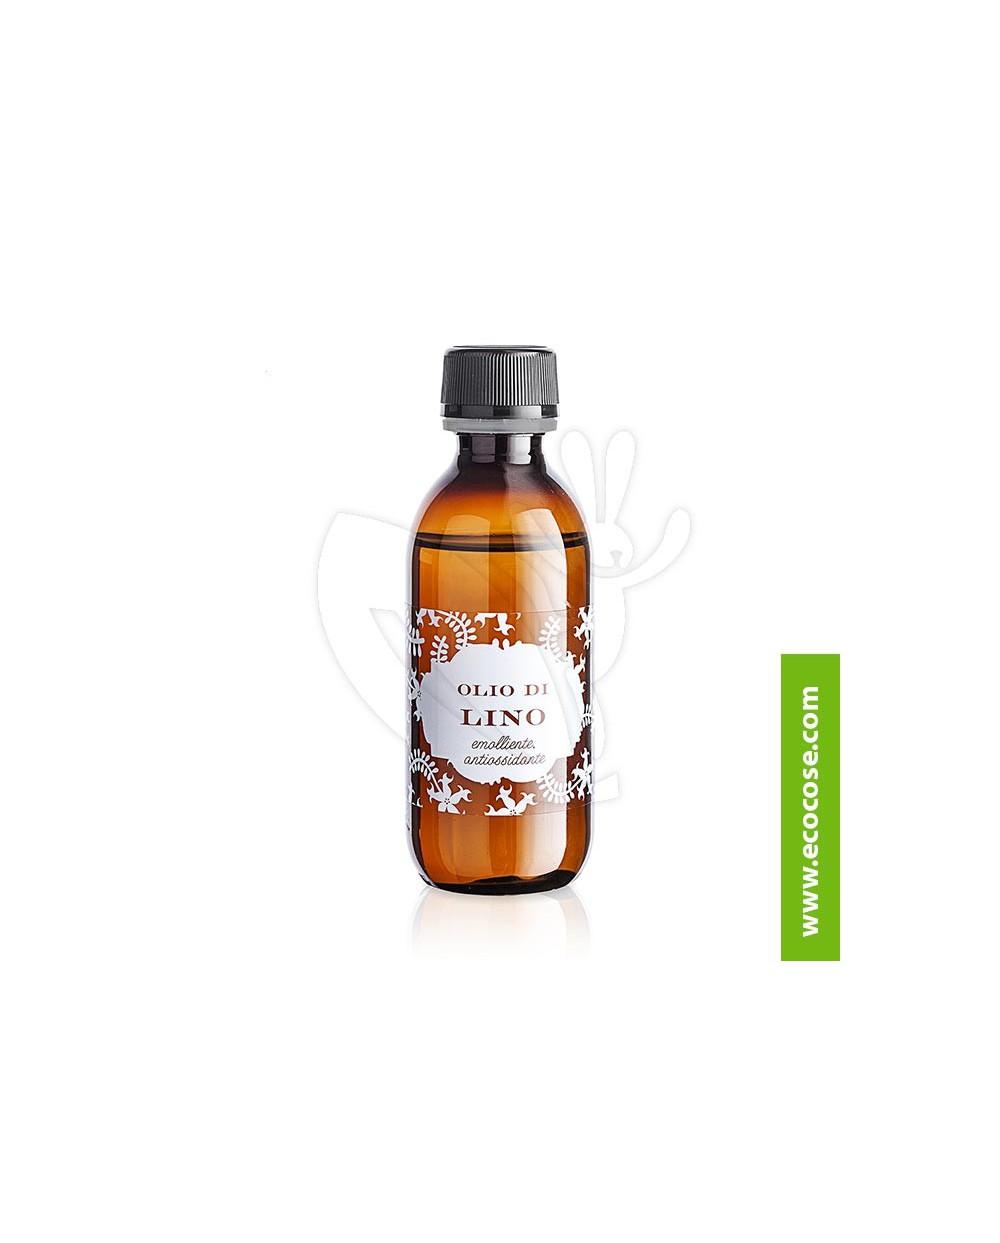 Officina Naturae - Olio di Lino